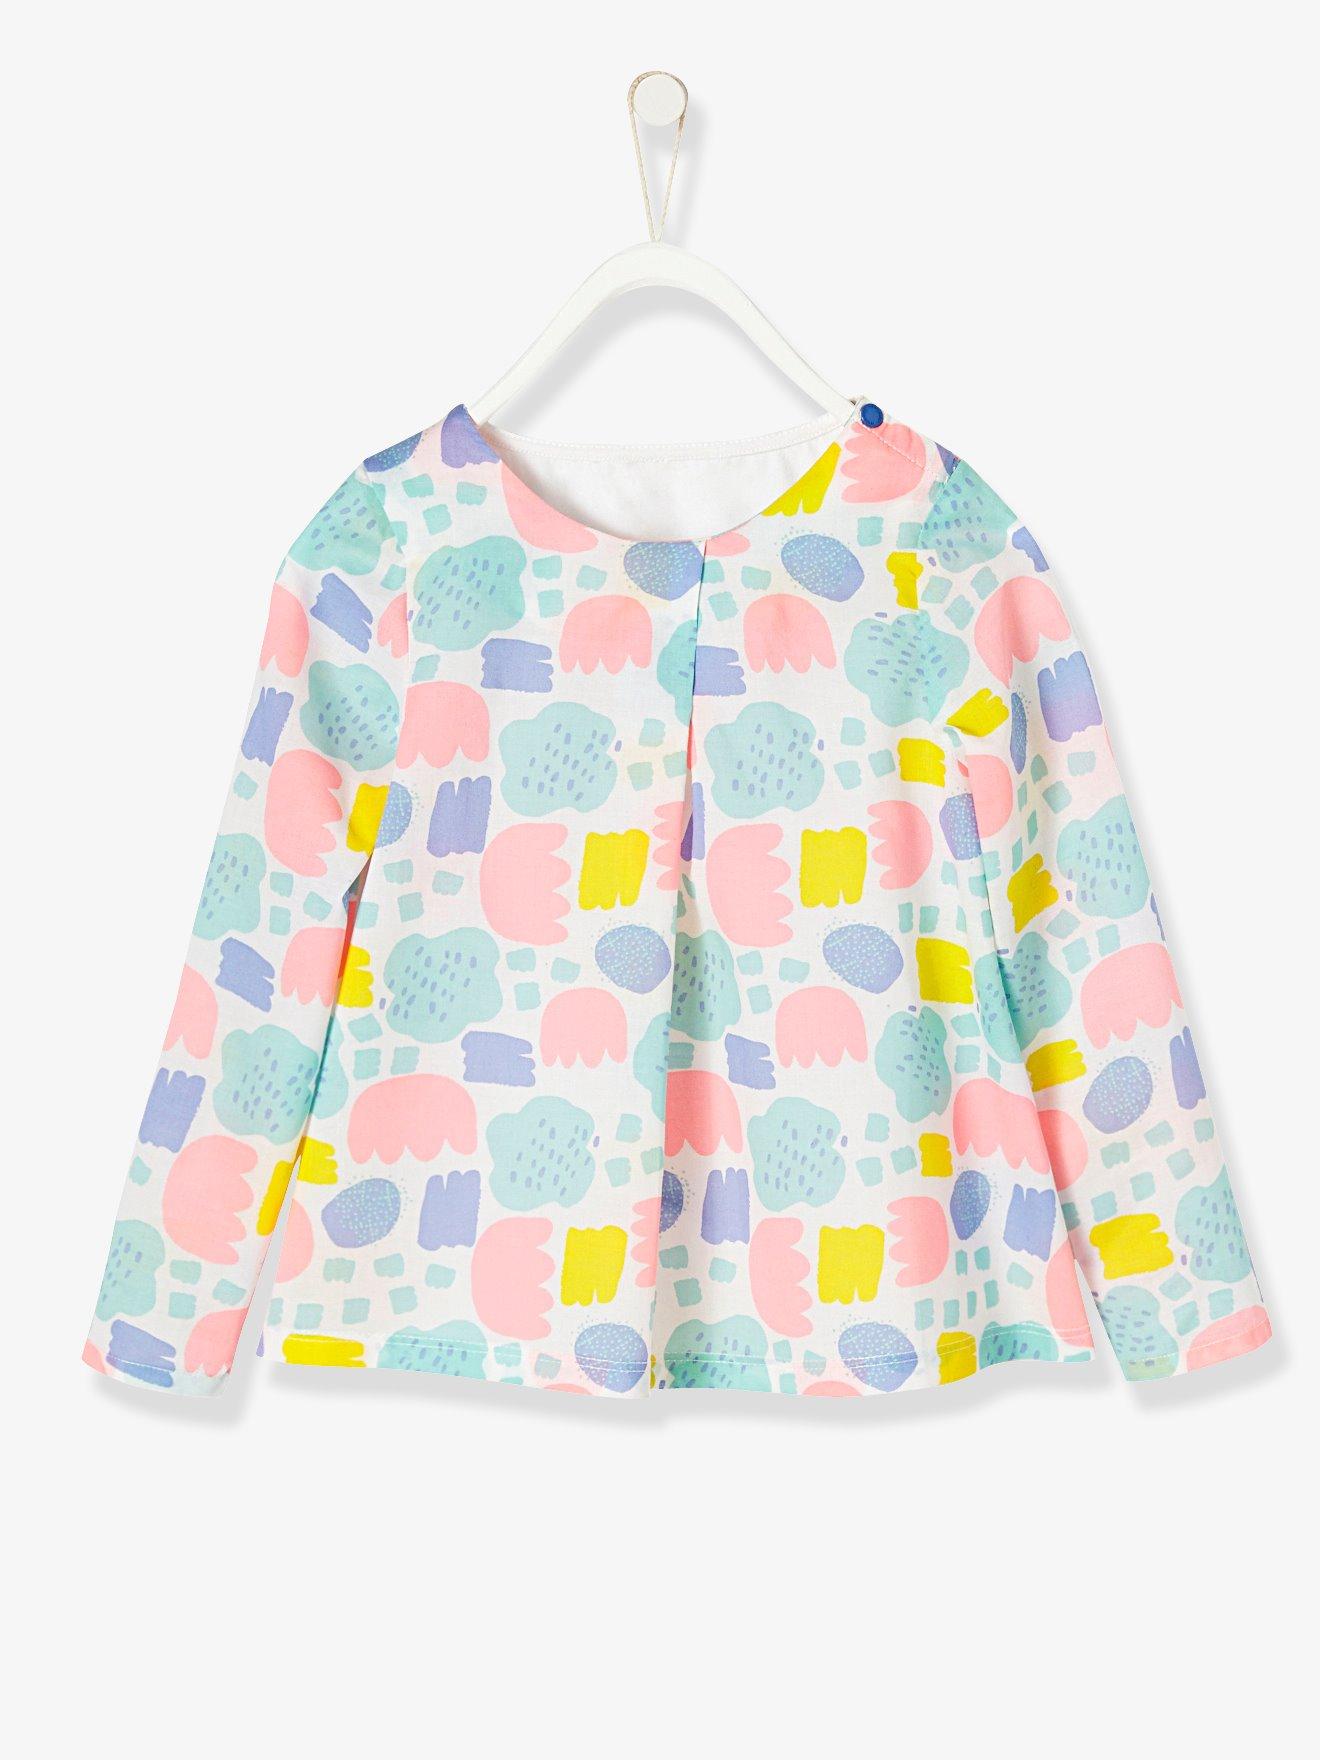 94afa8505 Blusa estampada para niña de dos tejidos blanco claro estampado